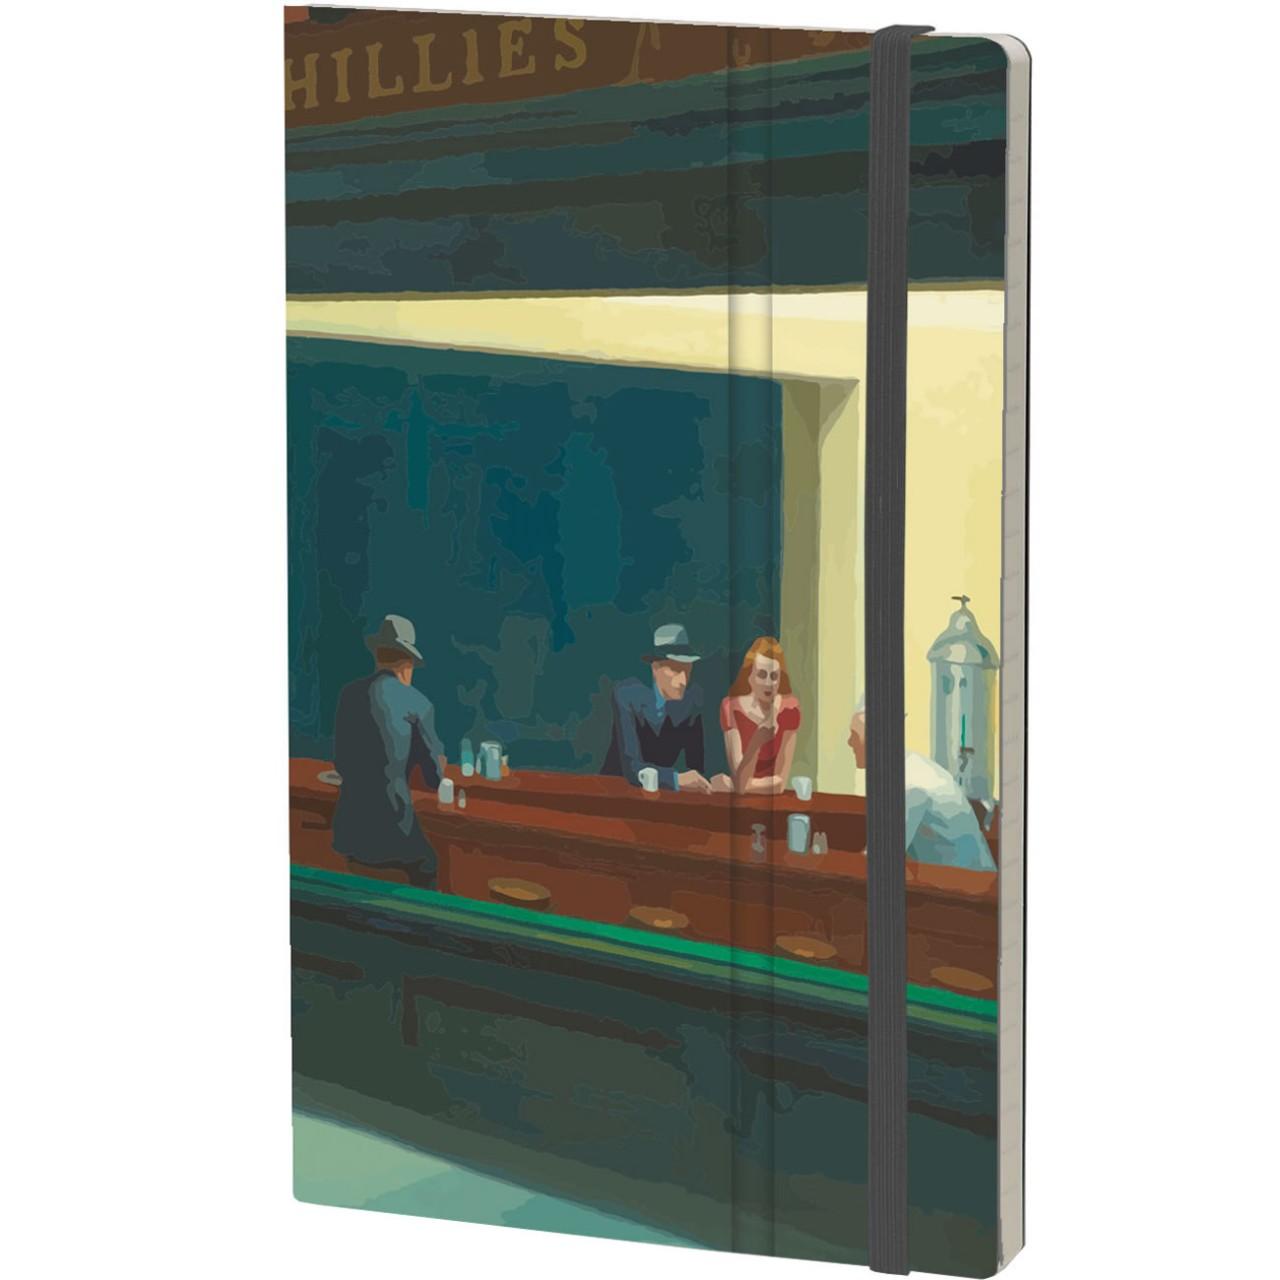 Stifflex Notizbuch ART 13 x 21 cm 192 S., HOPPER